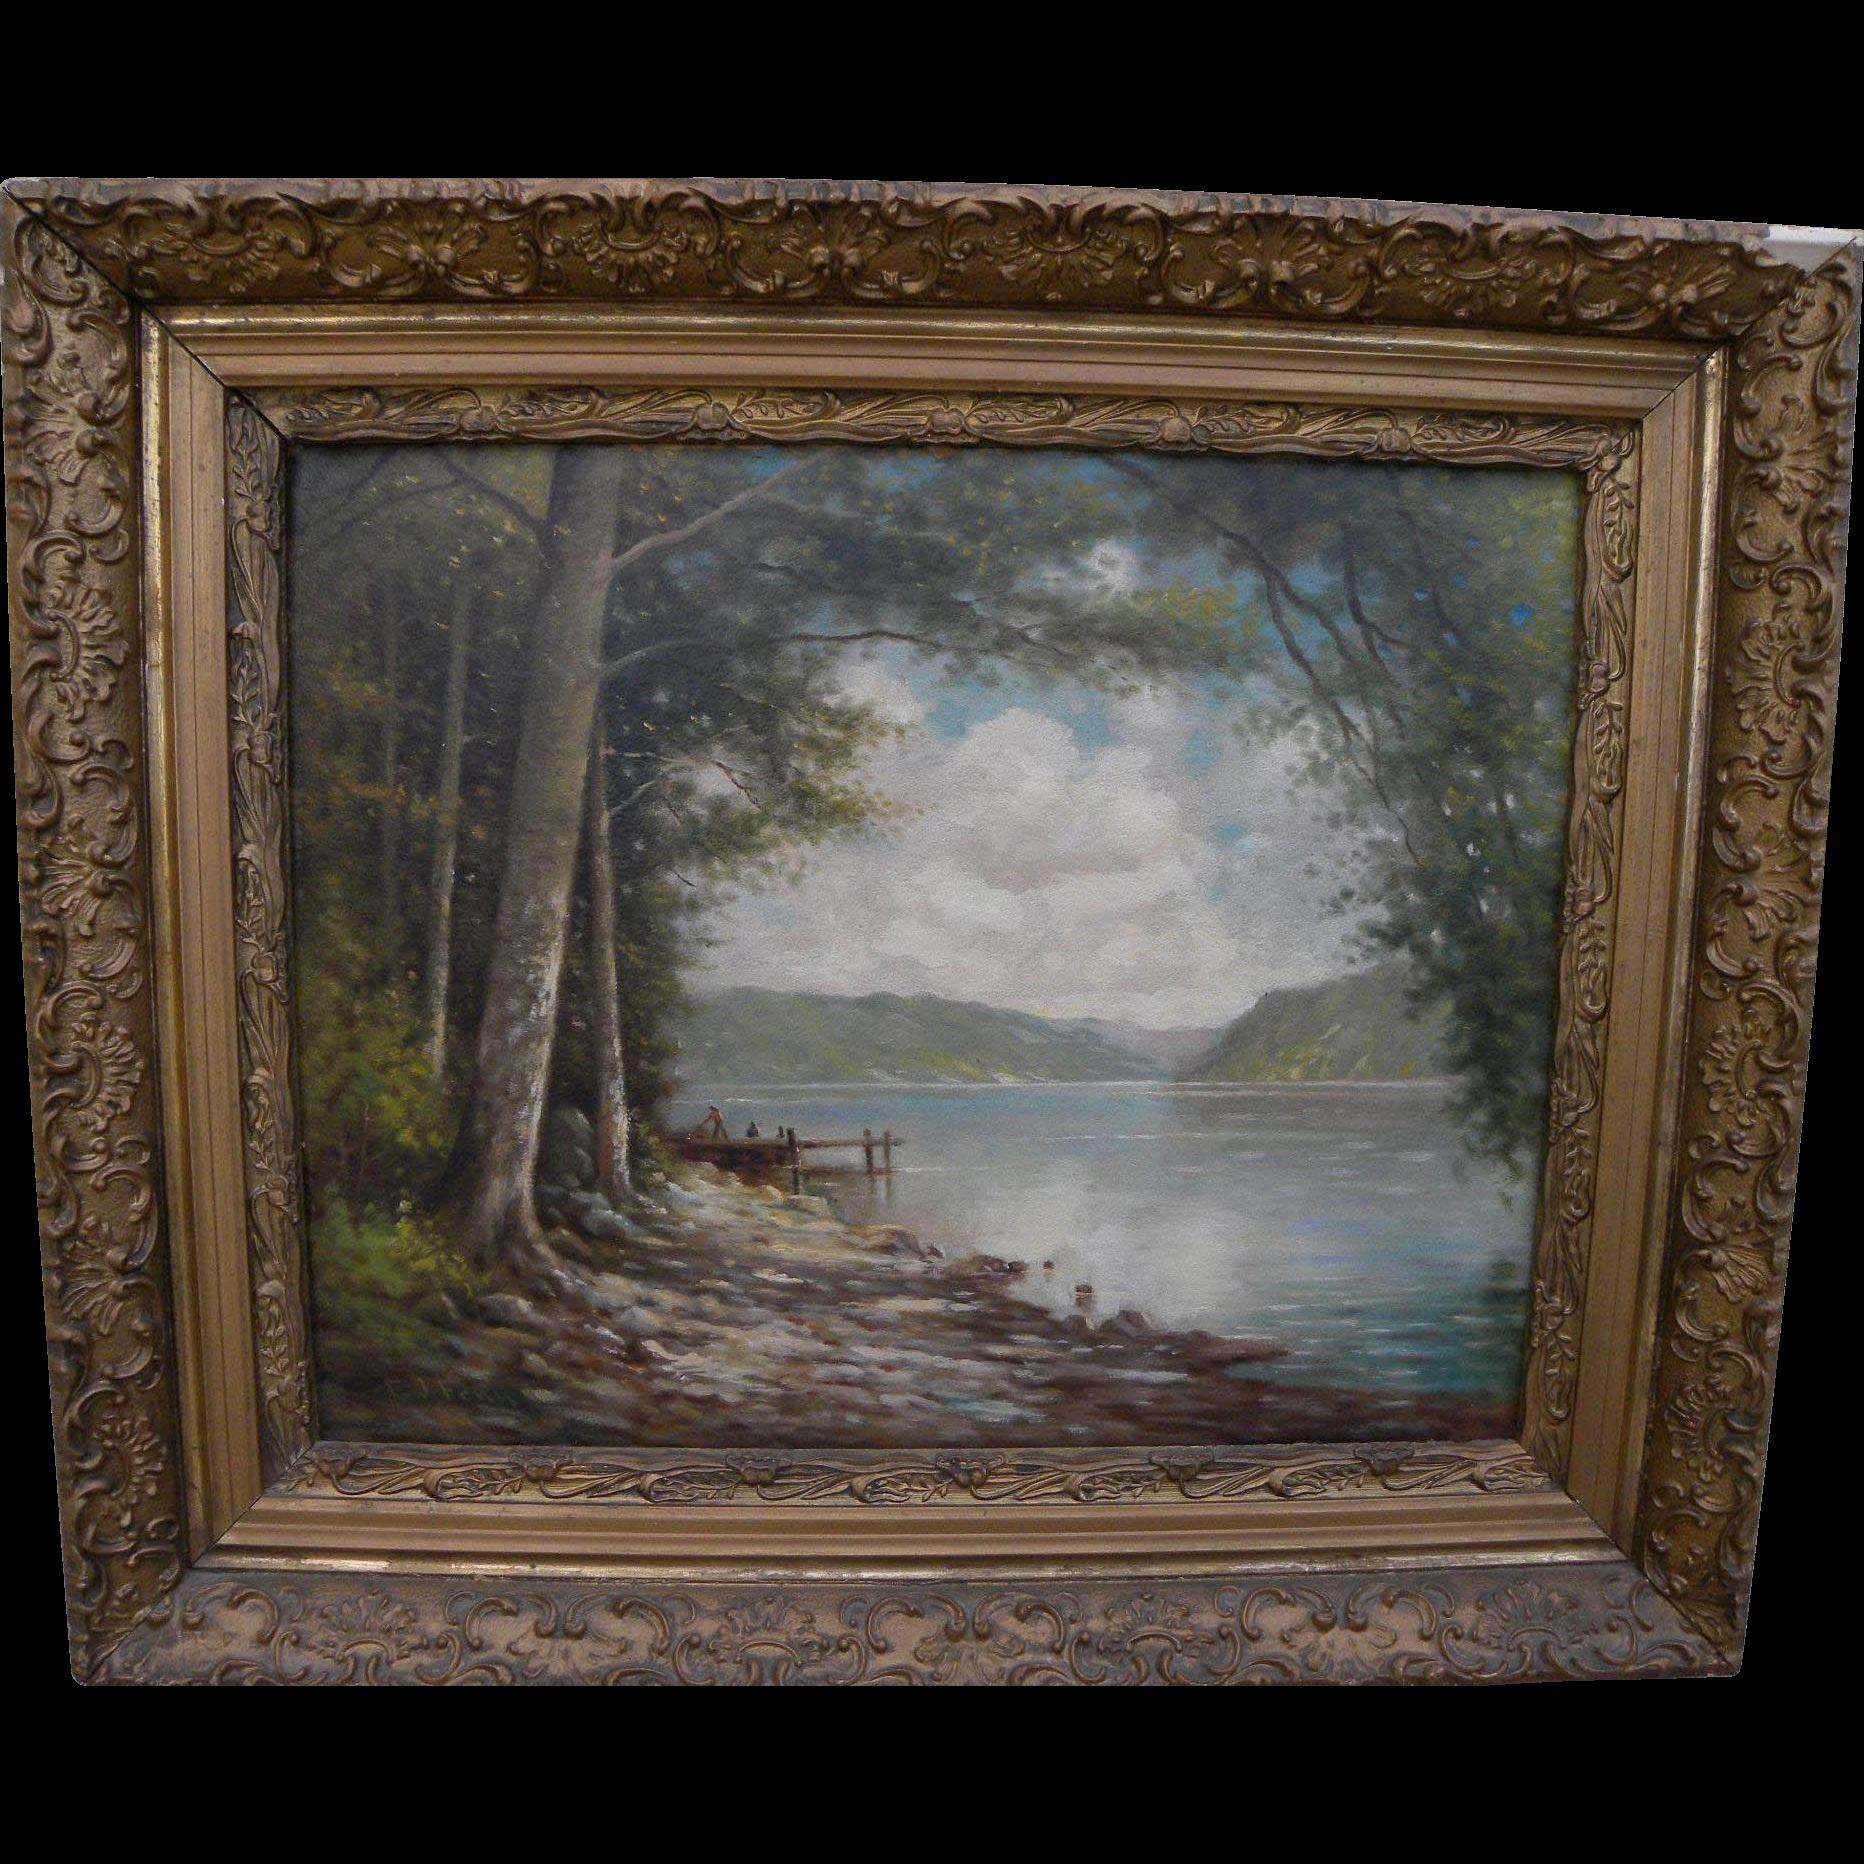 ELBRIDGE J. FENN (1857-1934) nicely framed vintage painting of upstate lake landscape by listed New York artist